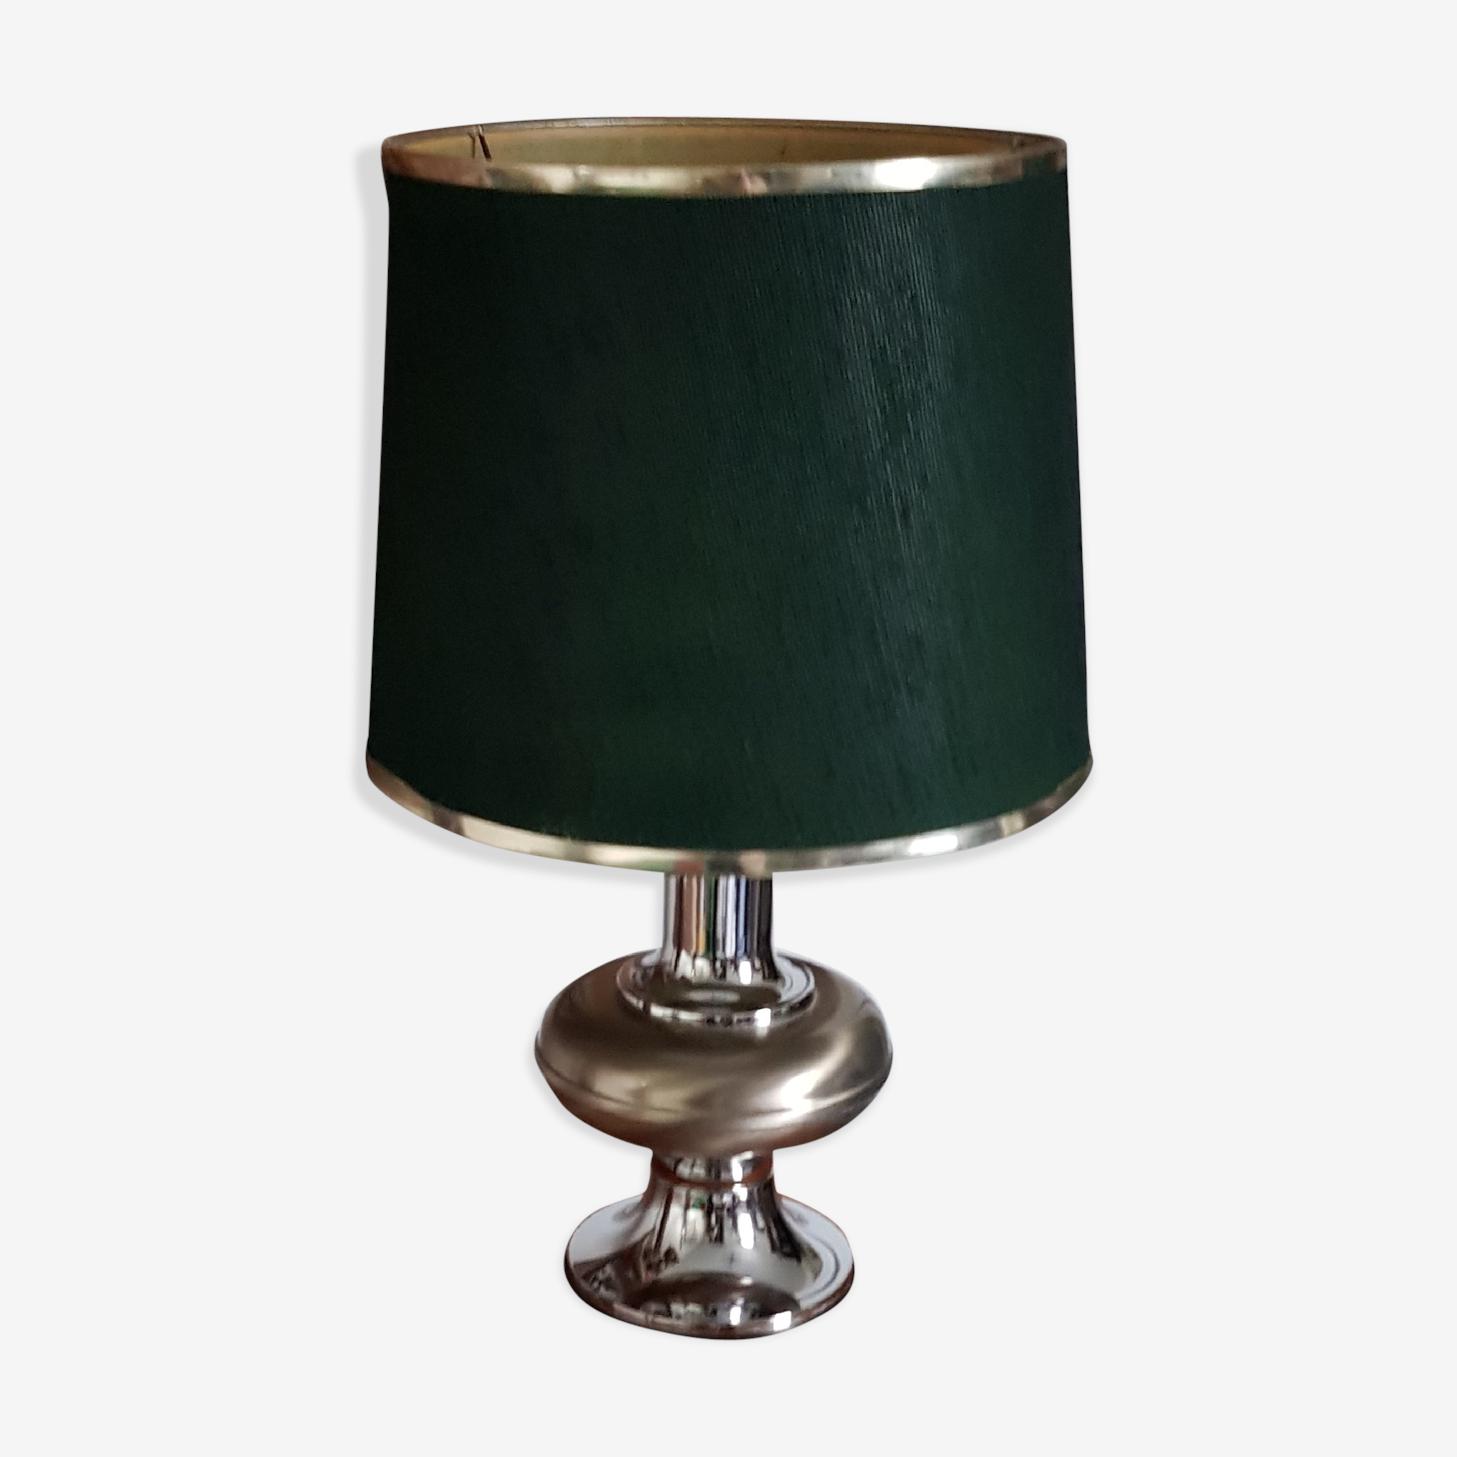 Lampe 1970 circa